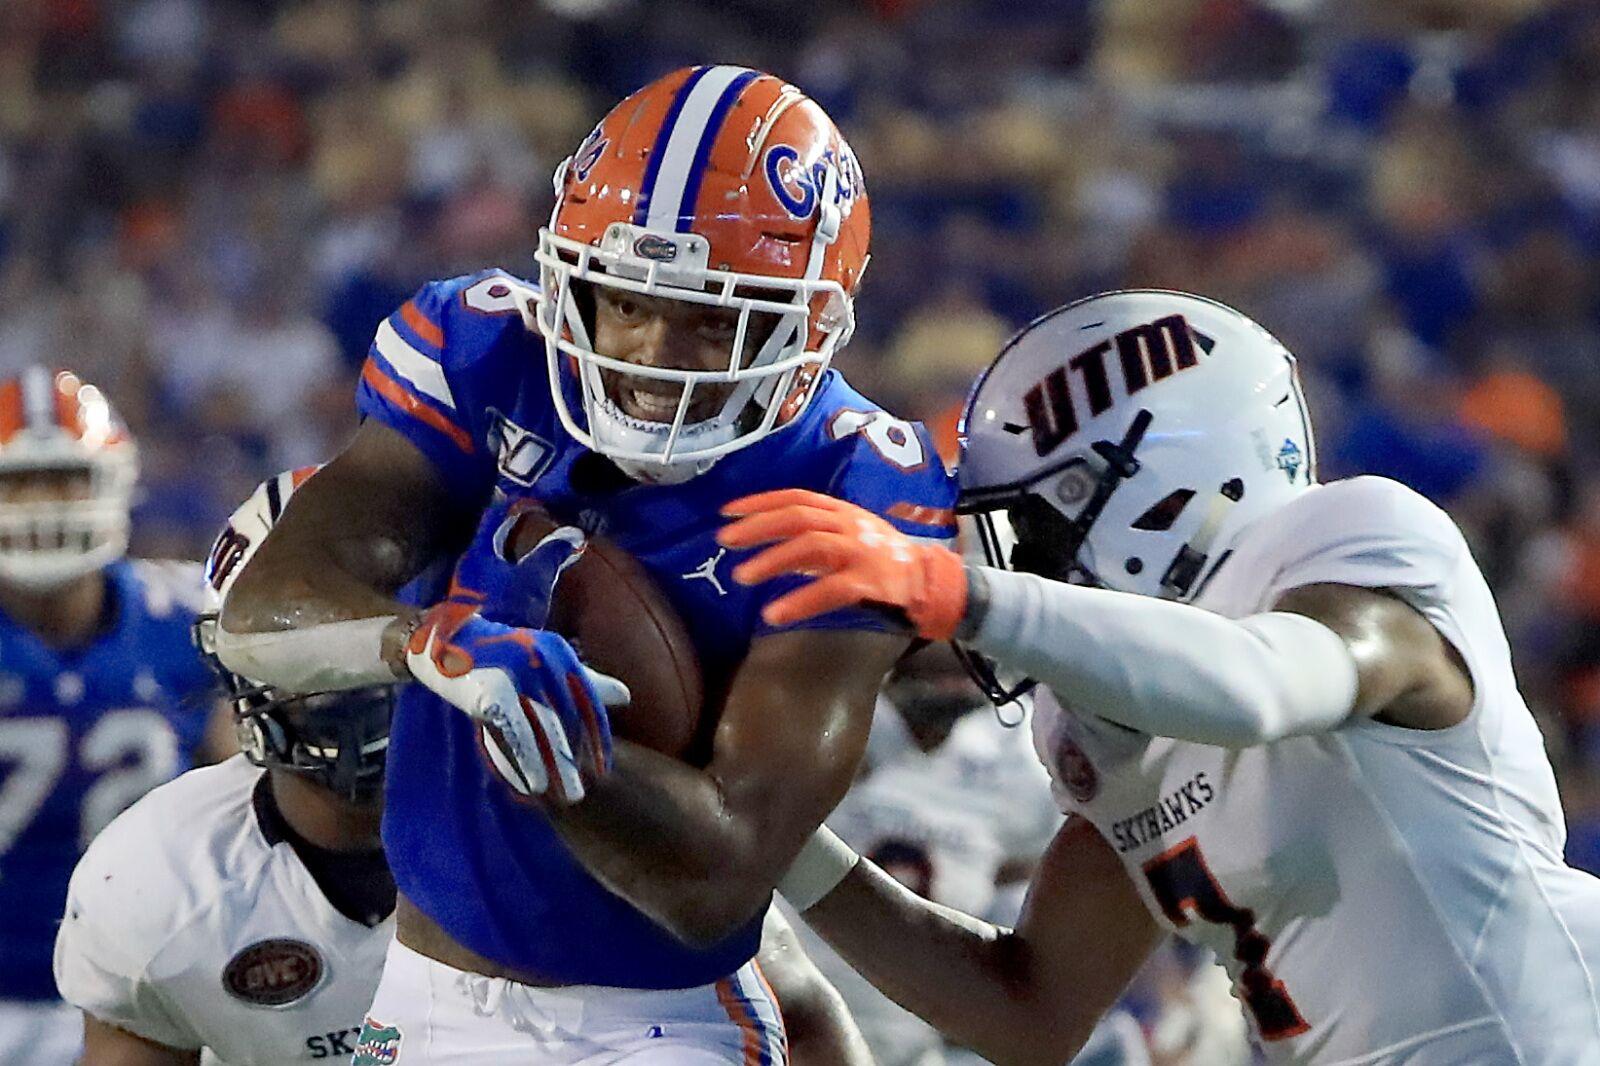 Florida football: Time set for Florida-Tennessee showdown